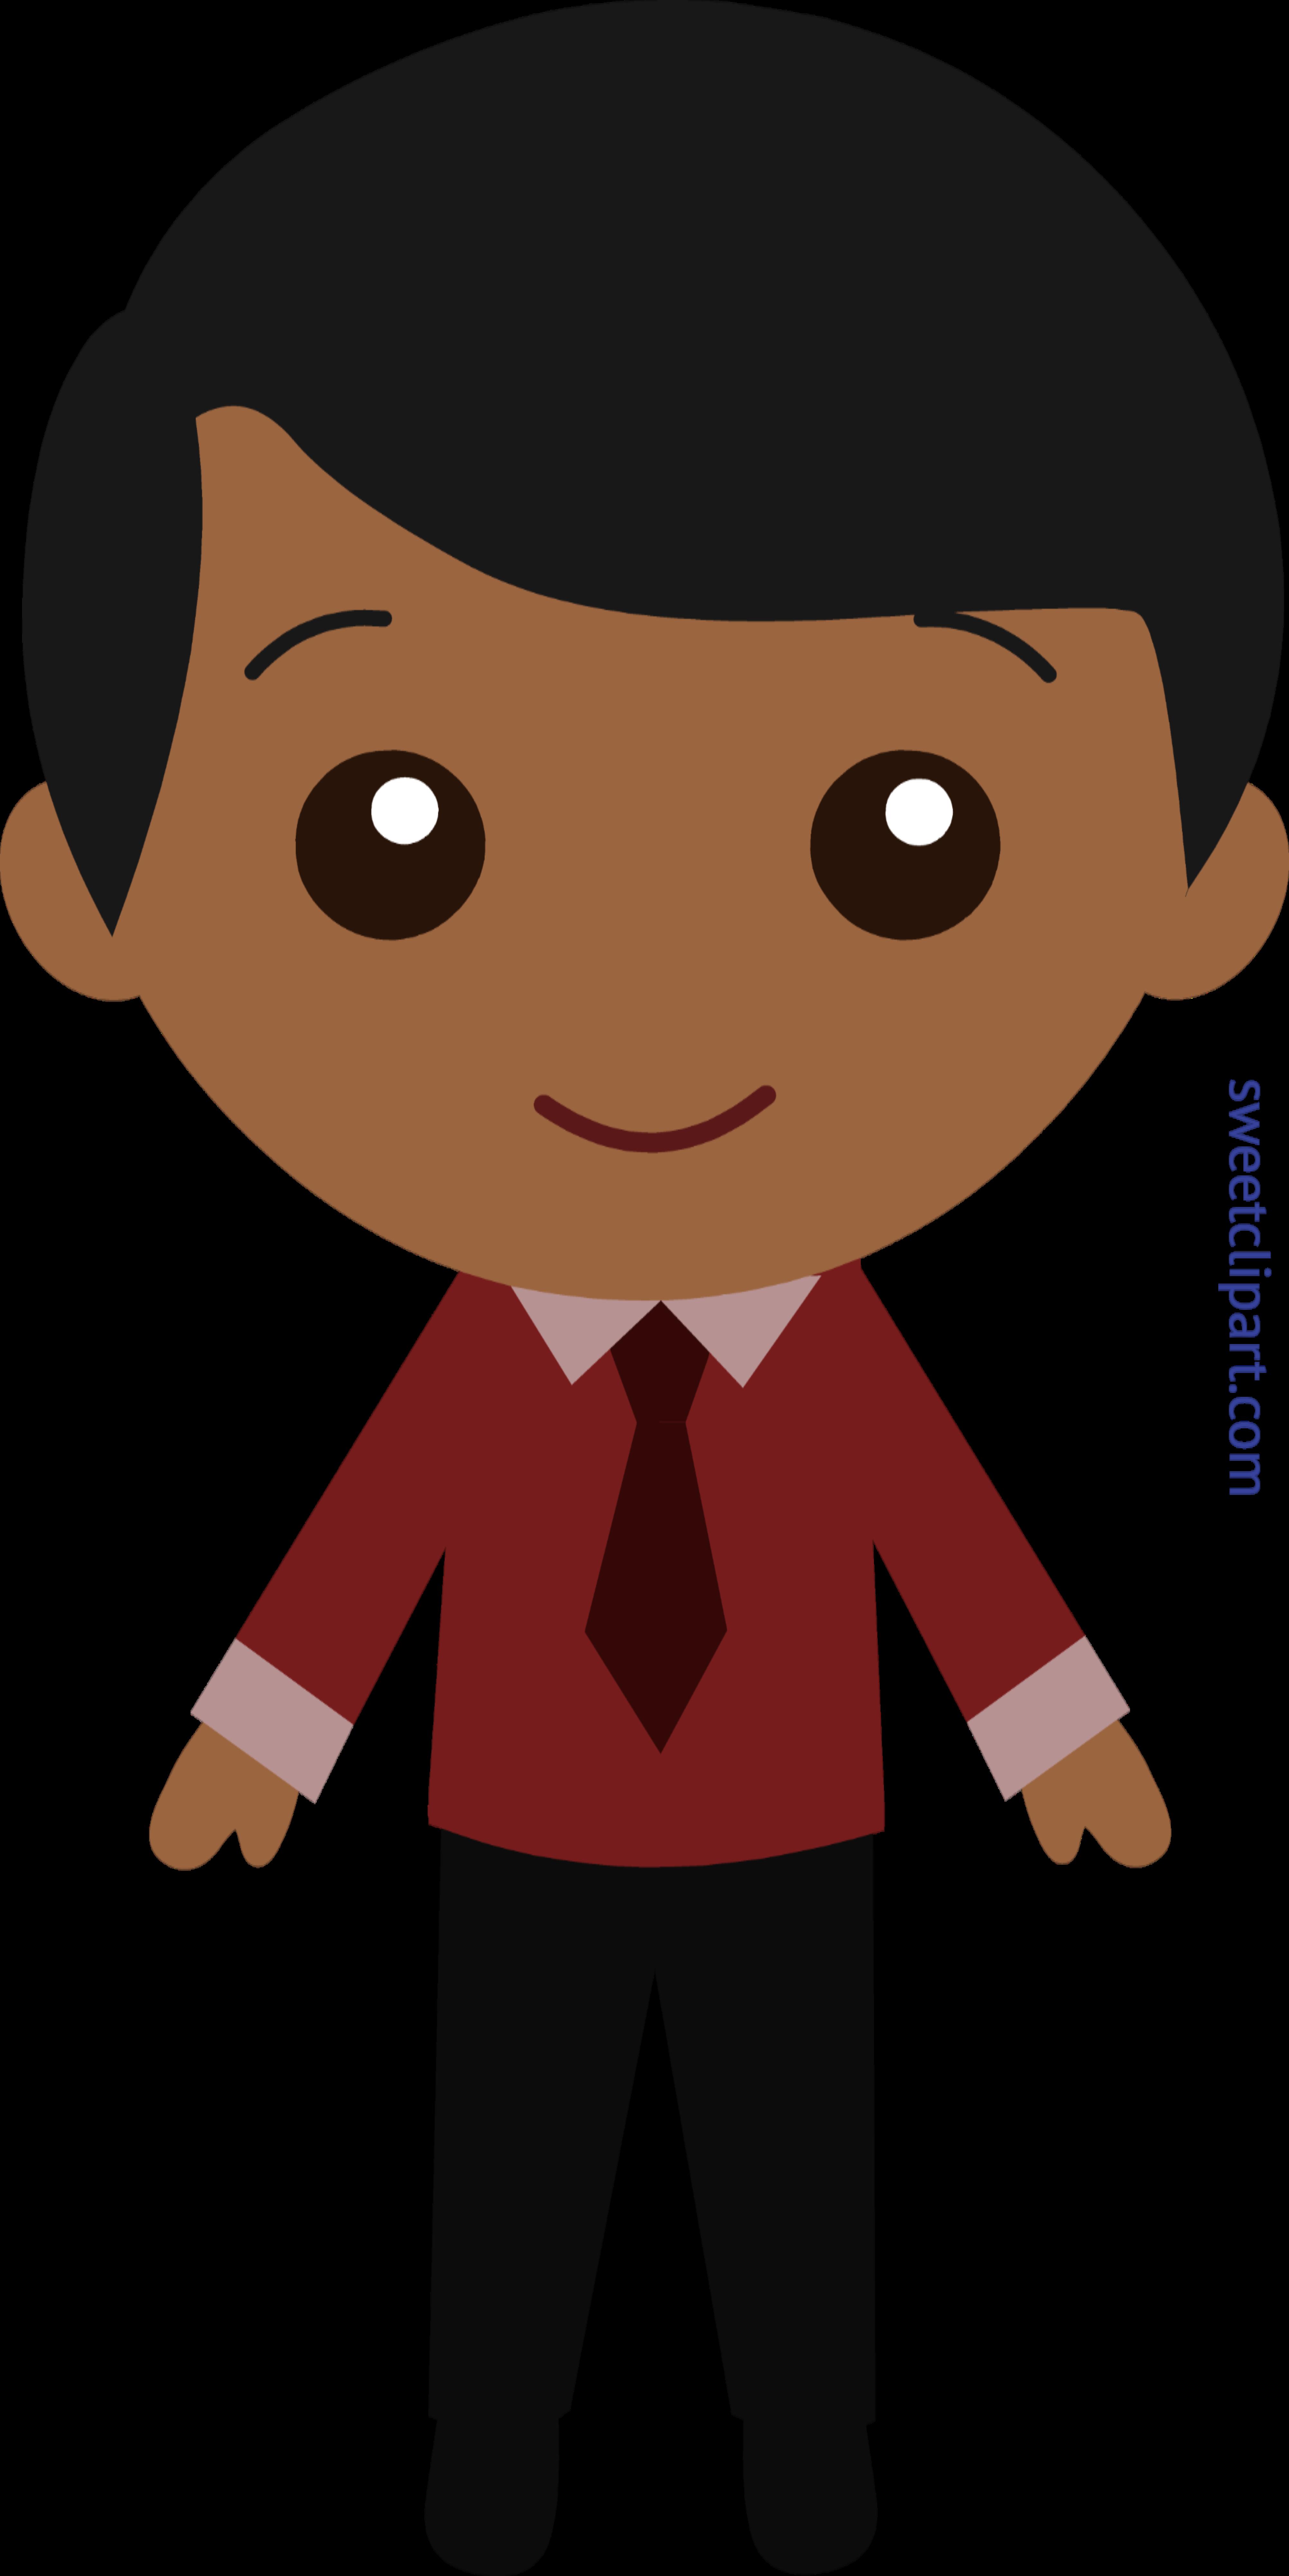 Little guy in suit. Faucet clipart classroom